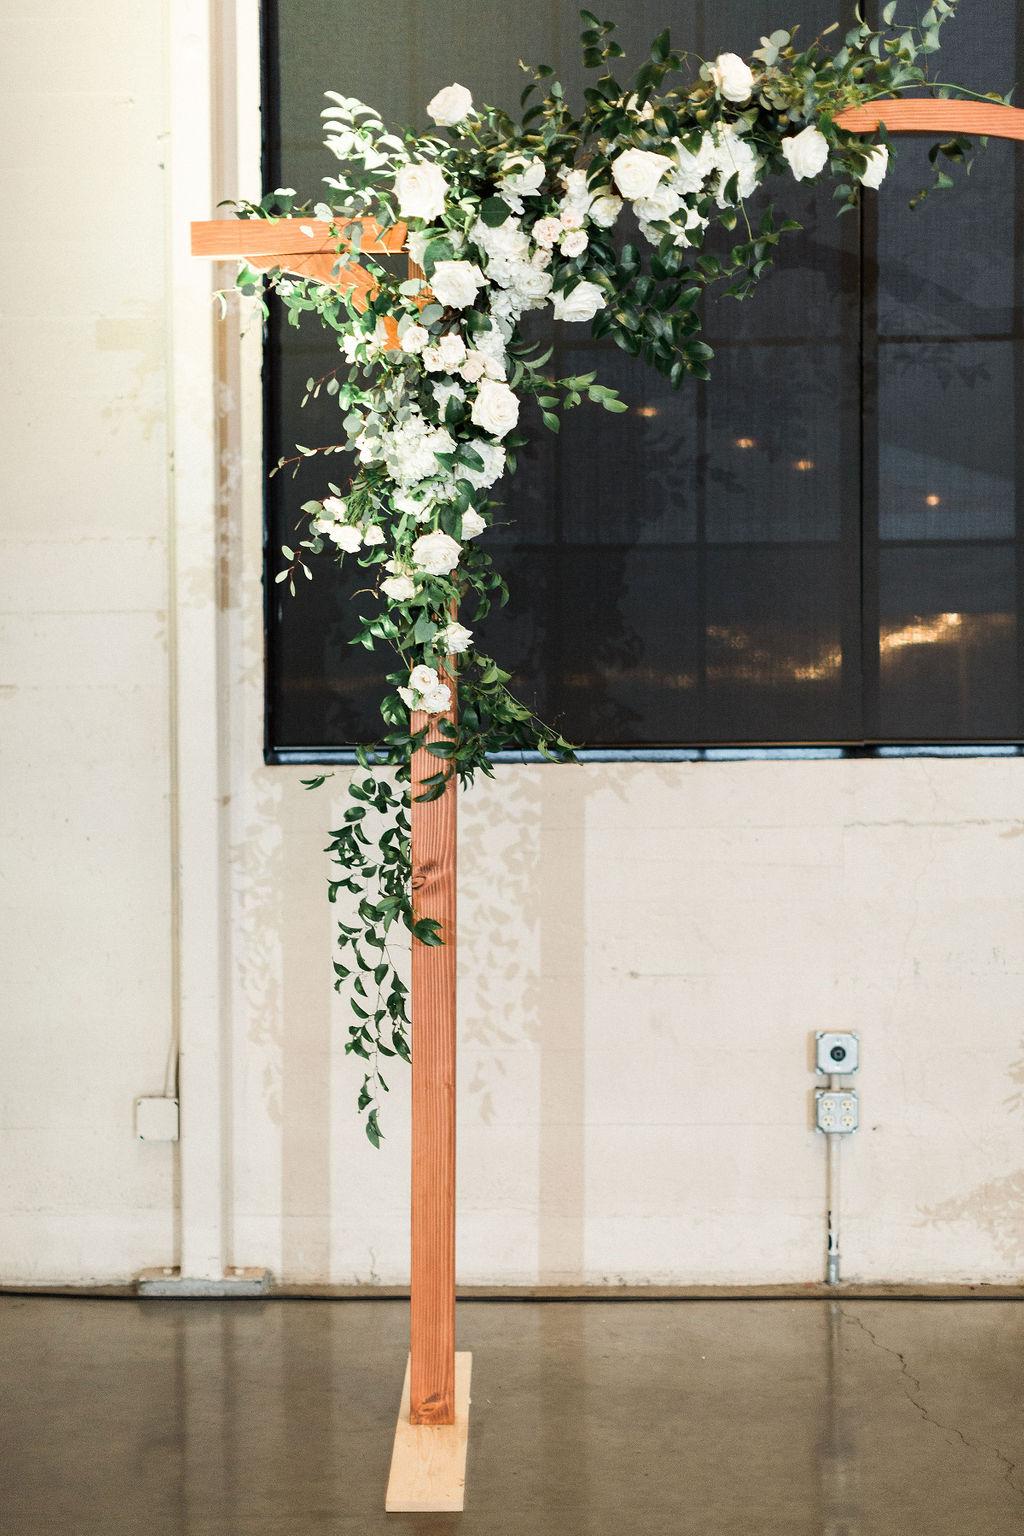 074portland,oregon,castaway,wedding,by_outlive_creative,photo,and,video.jpg